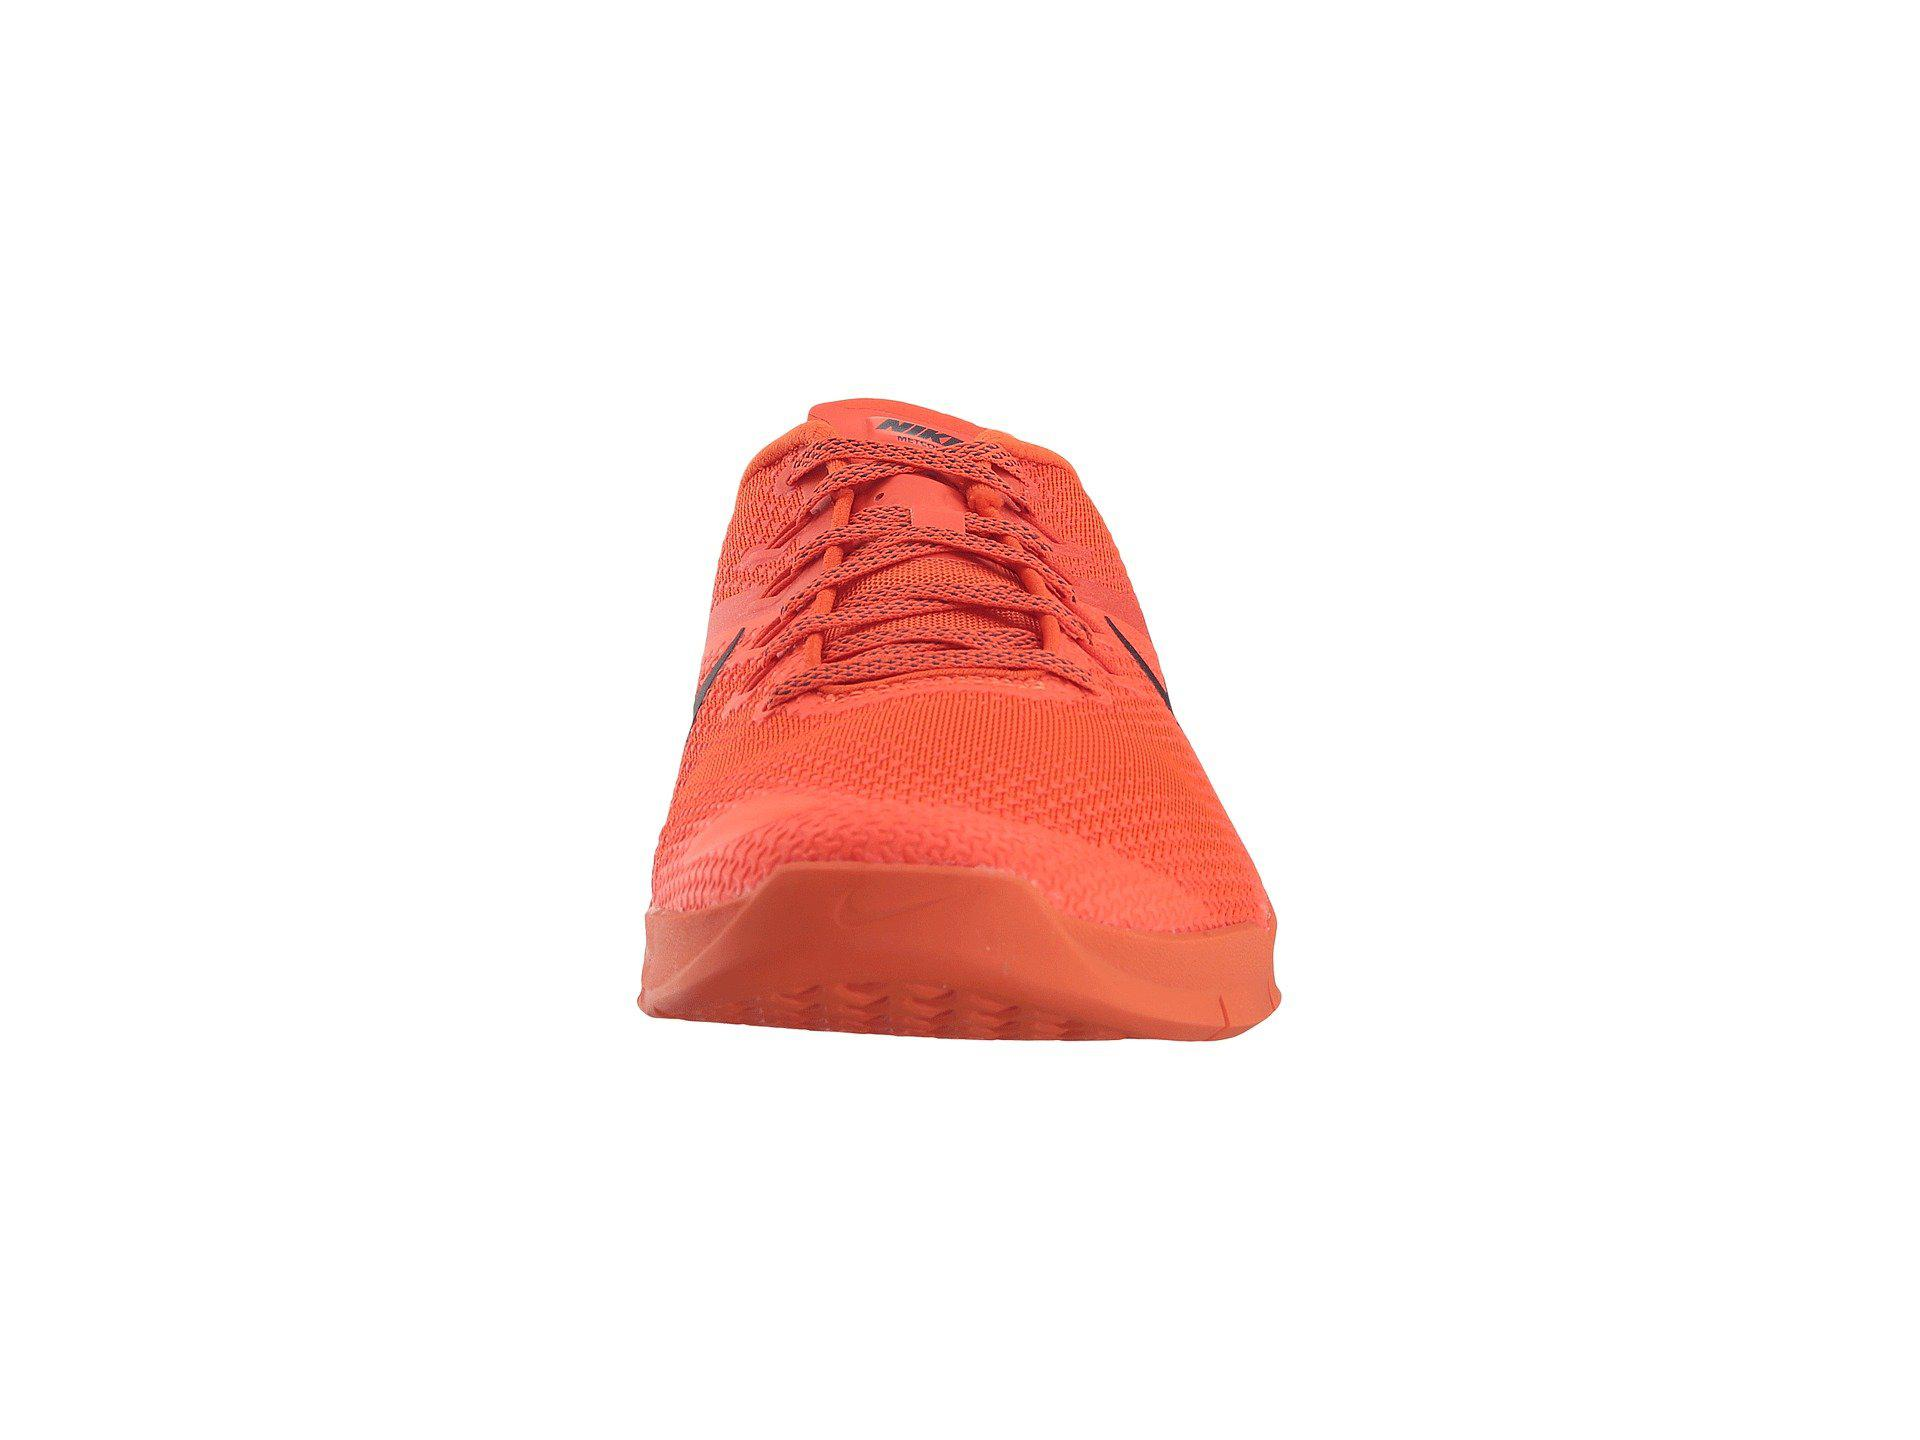 85a65e86fd89e Lyst - Nike Metcon 4 (black white) Men s Cross Training Shoes in ...